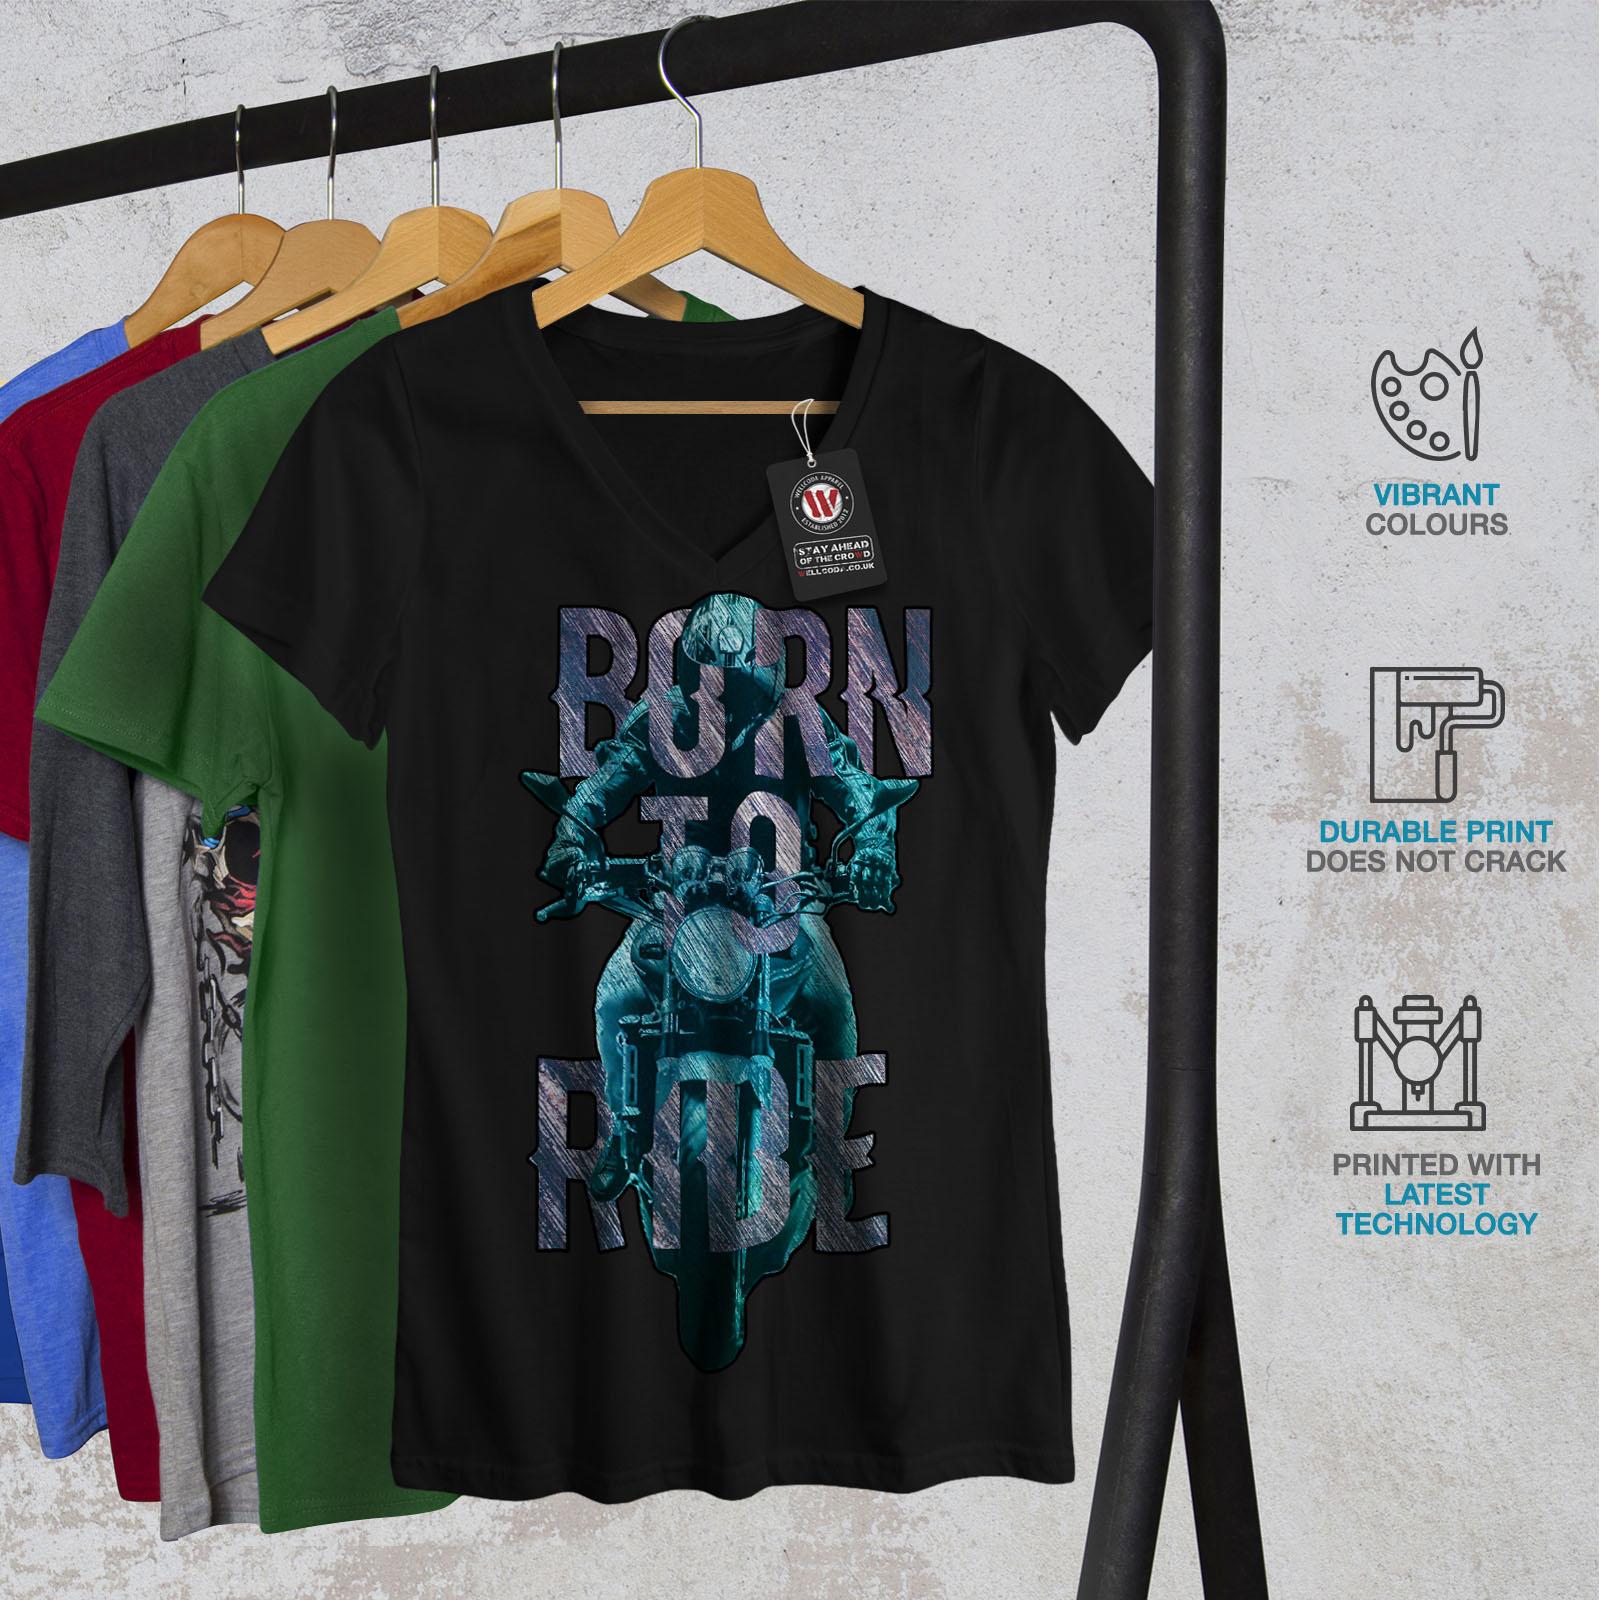 Wellcoda-Born-to-Ride-In-Metallo-Da-Donna-V-Neck-T-shirt-MOTORCYCLE-Design-Grafico-Tee miniatura 4